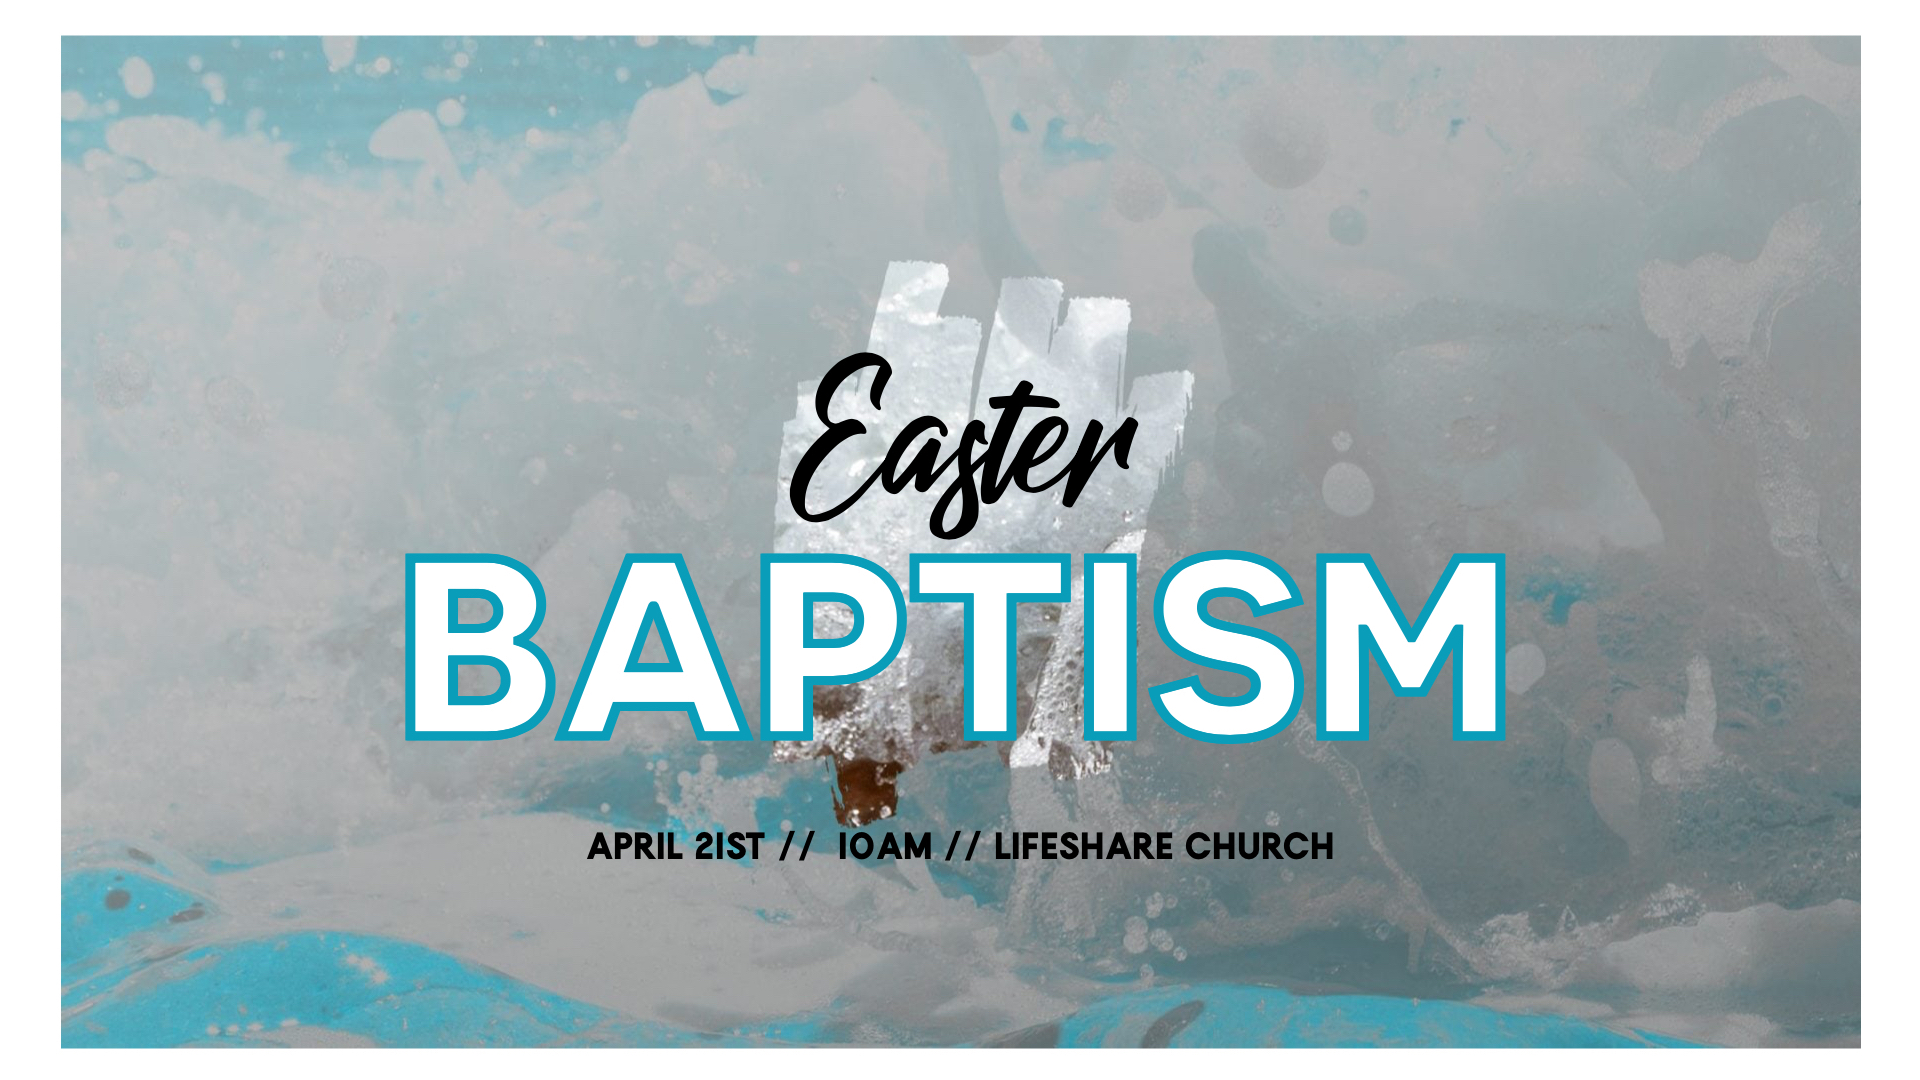 Baptism grapgic 2-20.jpeg